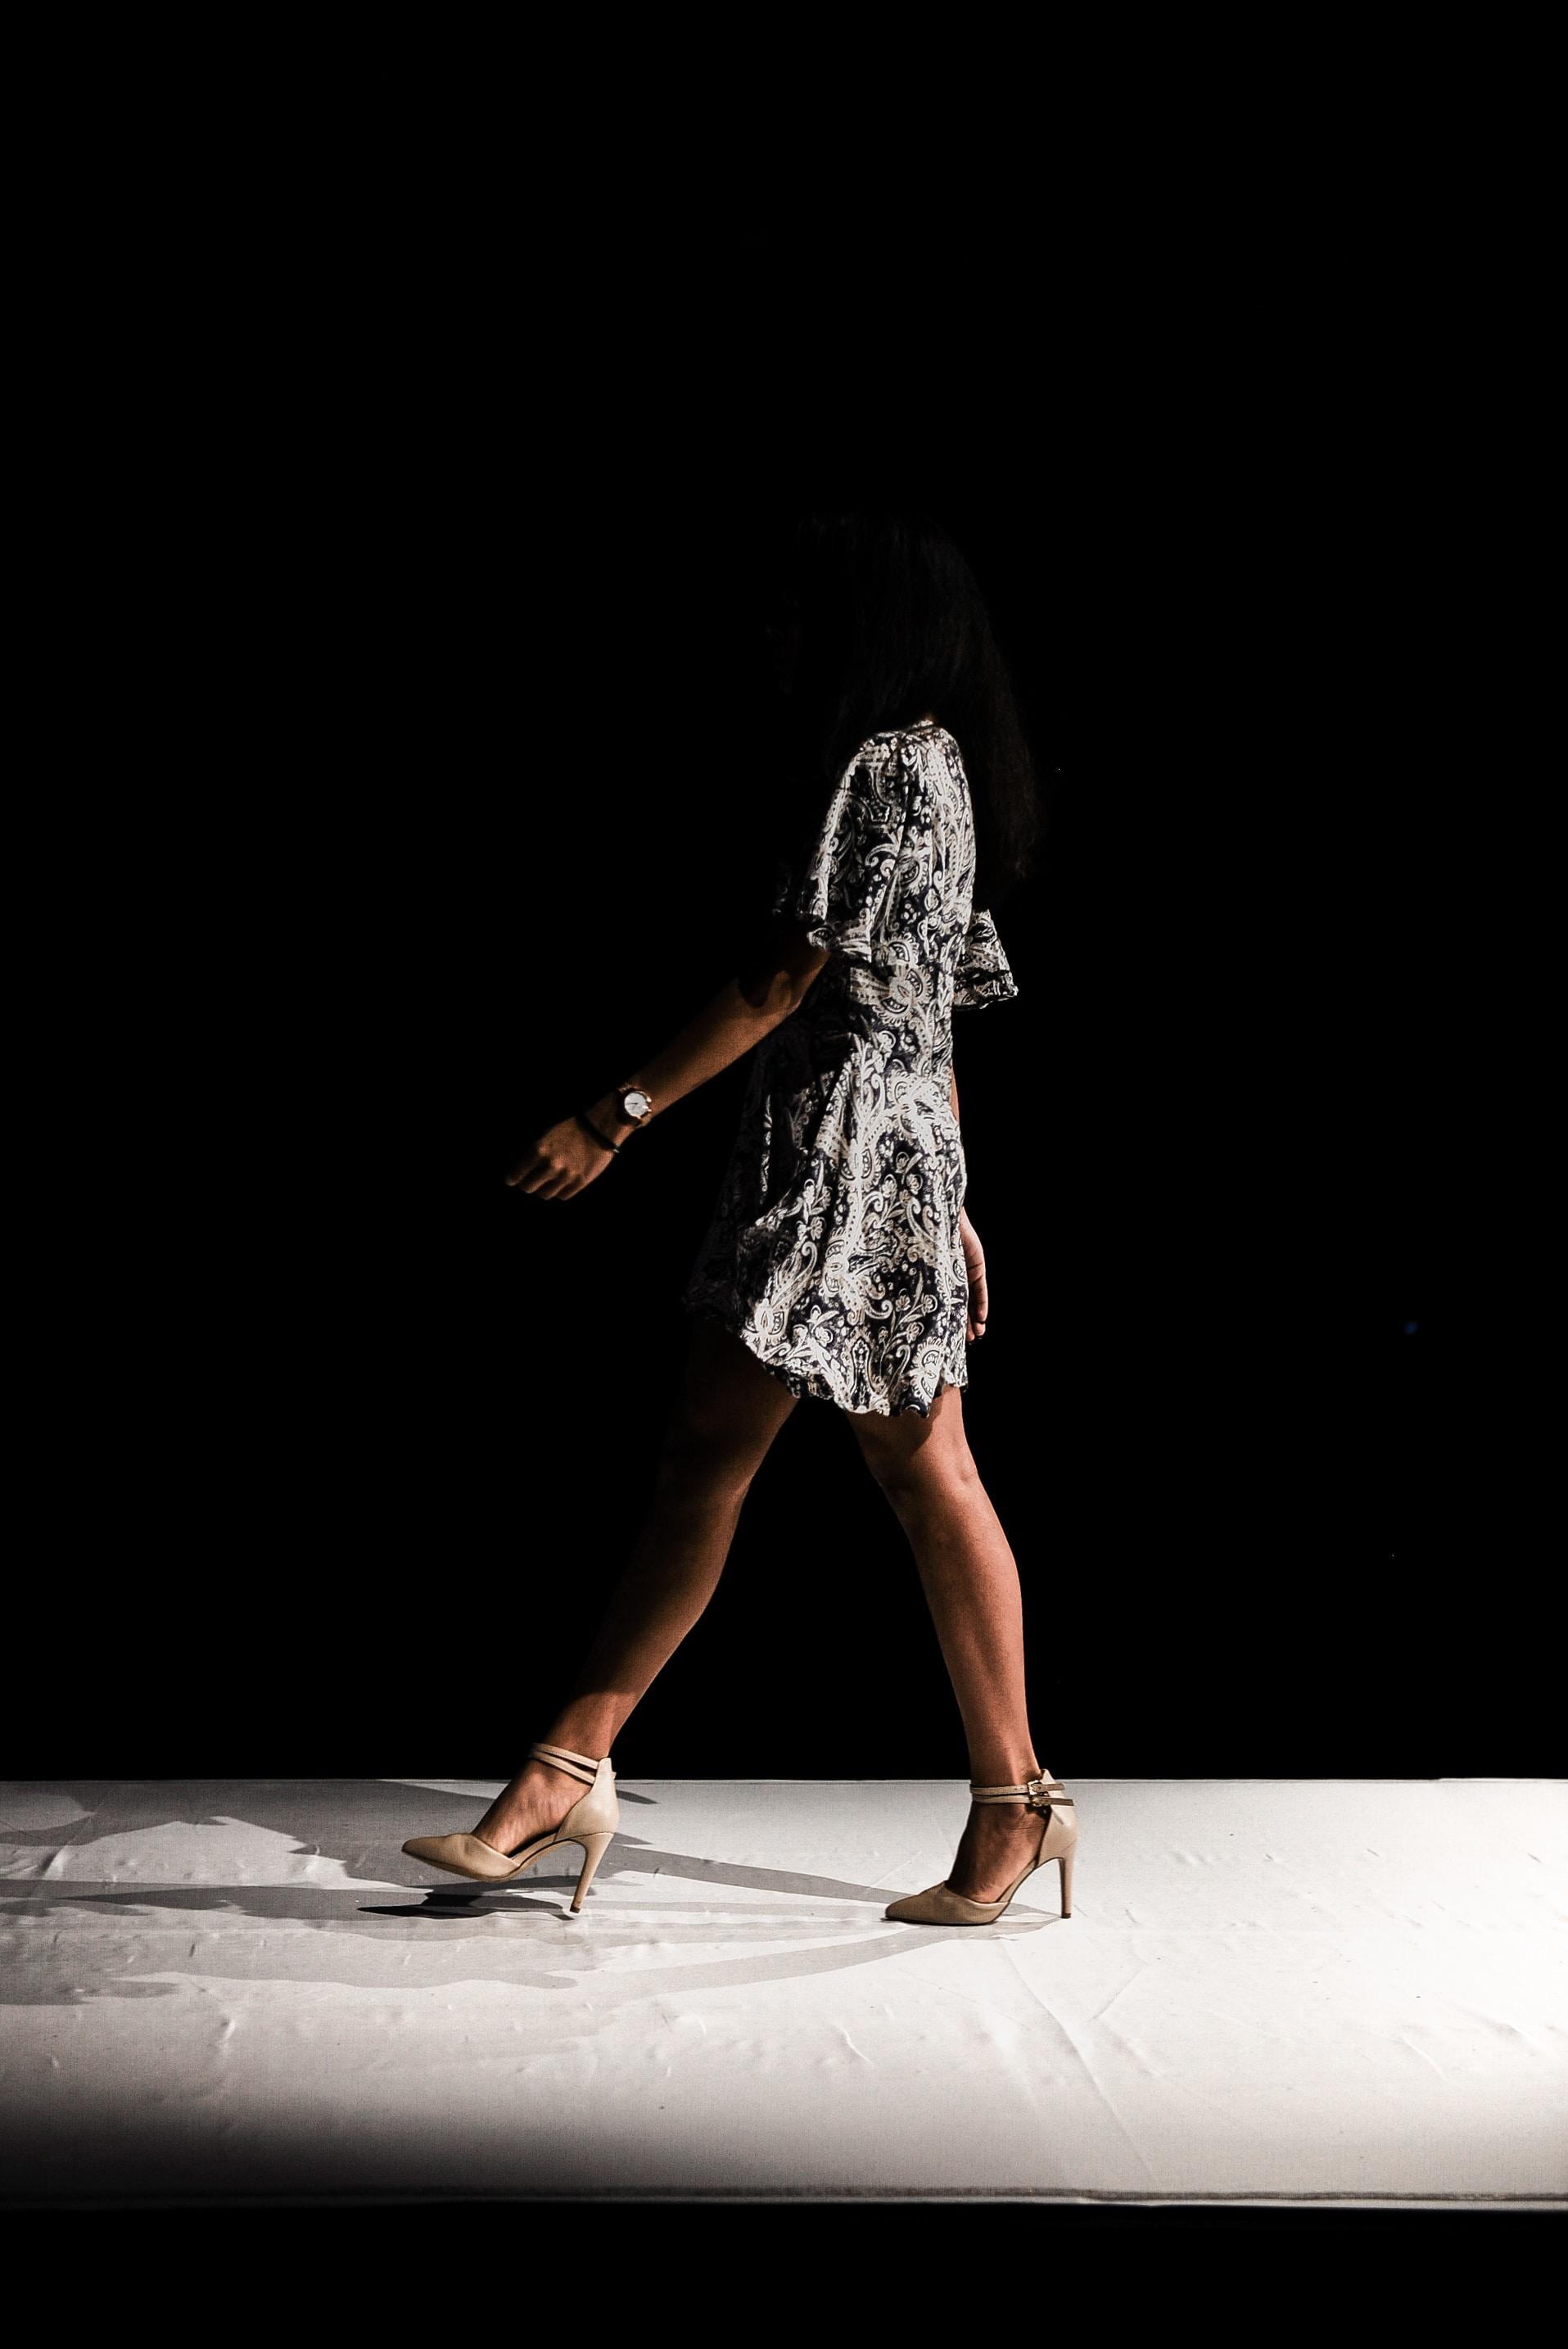 woman wearing black and white floral dress walks inside dark room